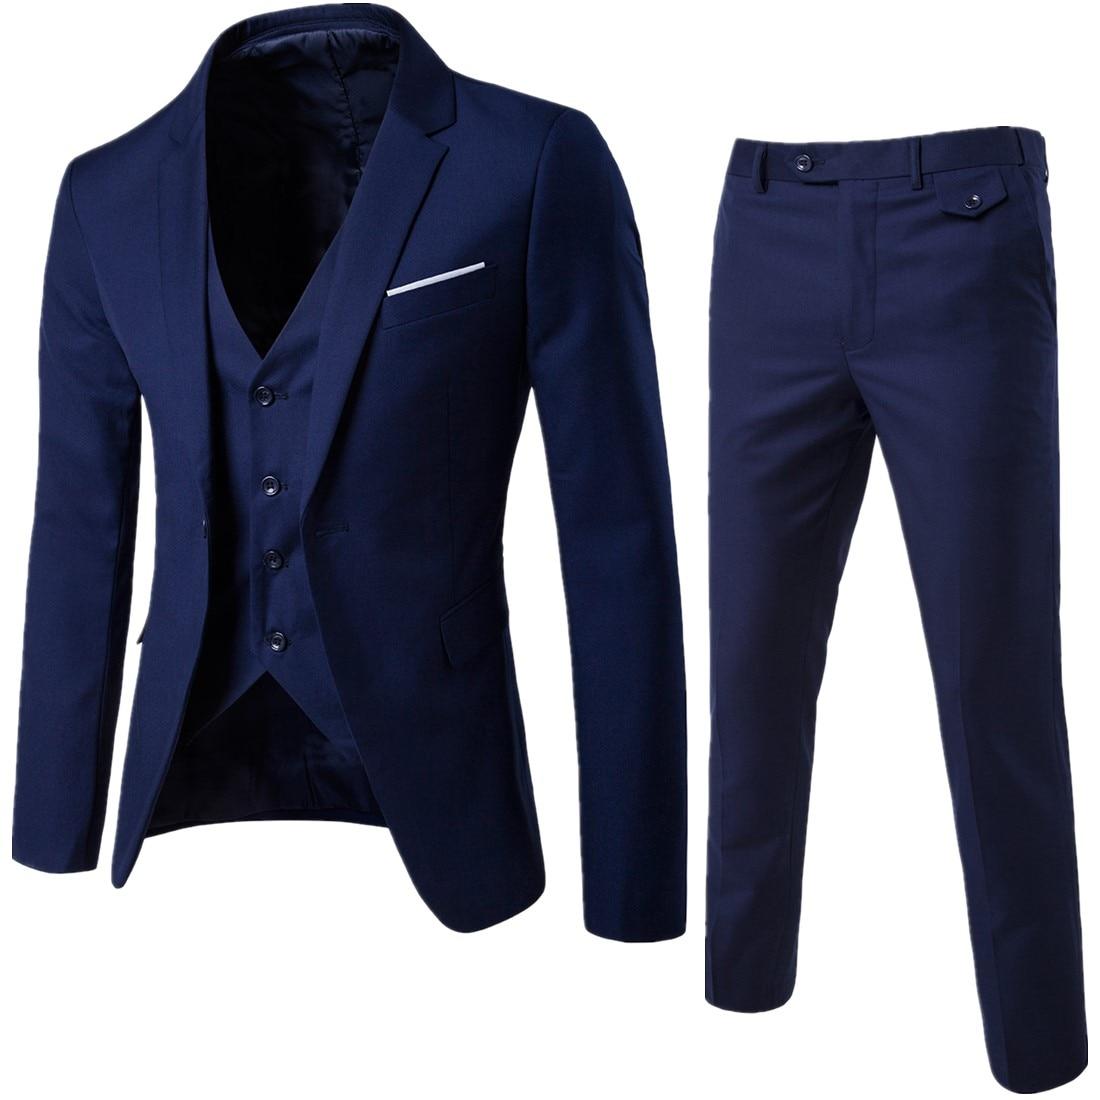 Mens Wedding Suits 2019 Red Oranje Pak Heren Royal Blue Party DJ Stage Costume Terno Slim Fit White Tuxedo